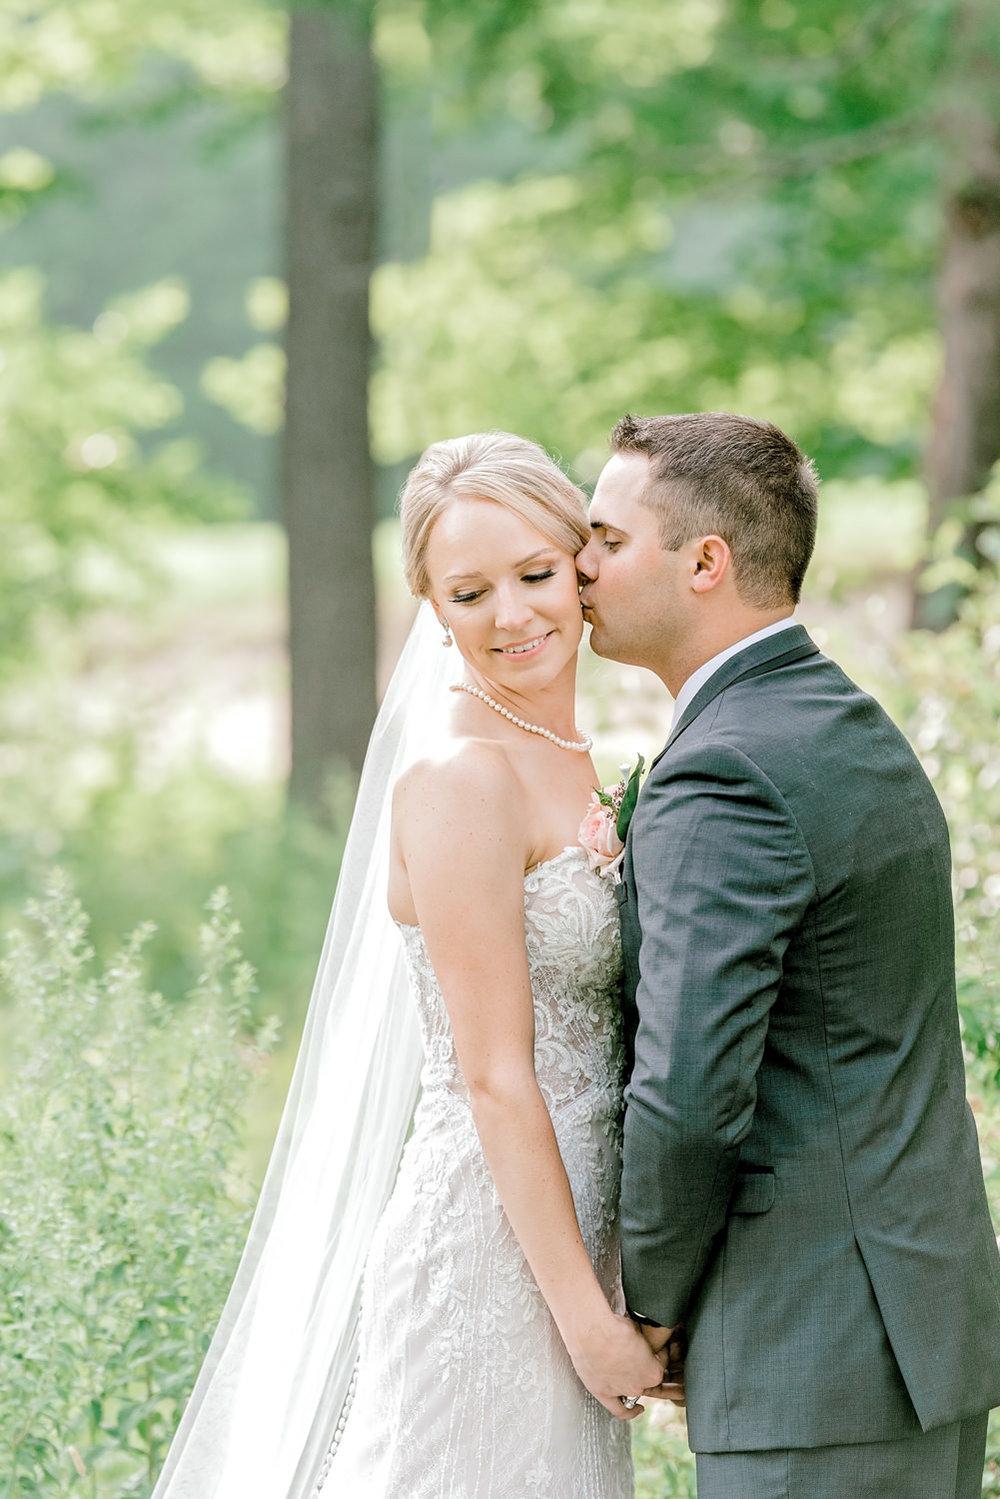 South Berwick Maine Wedding at Spring Hill